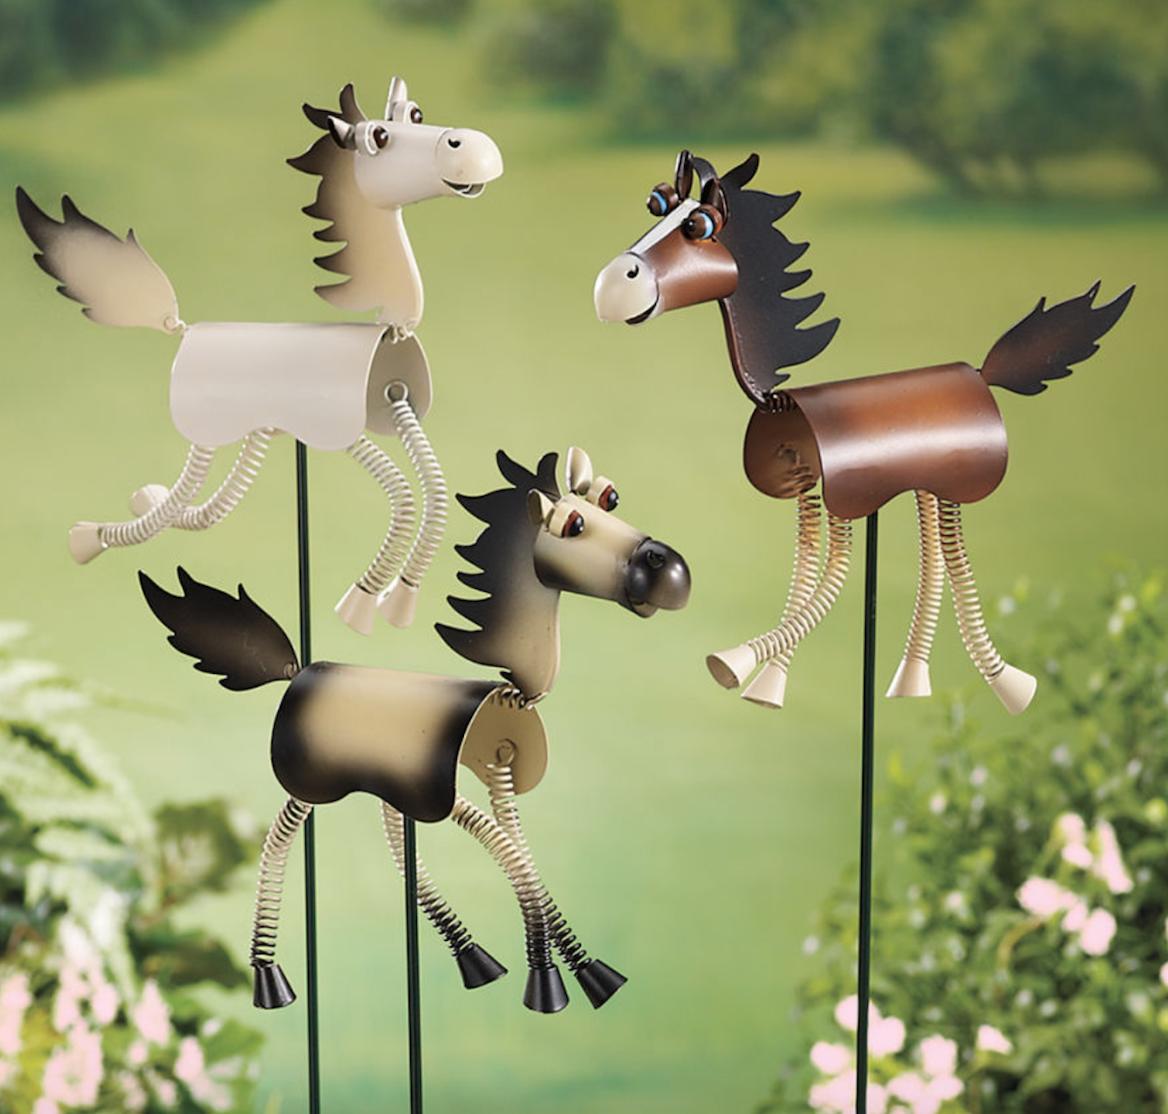 horse lawn ornaments